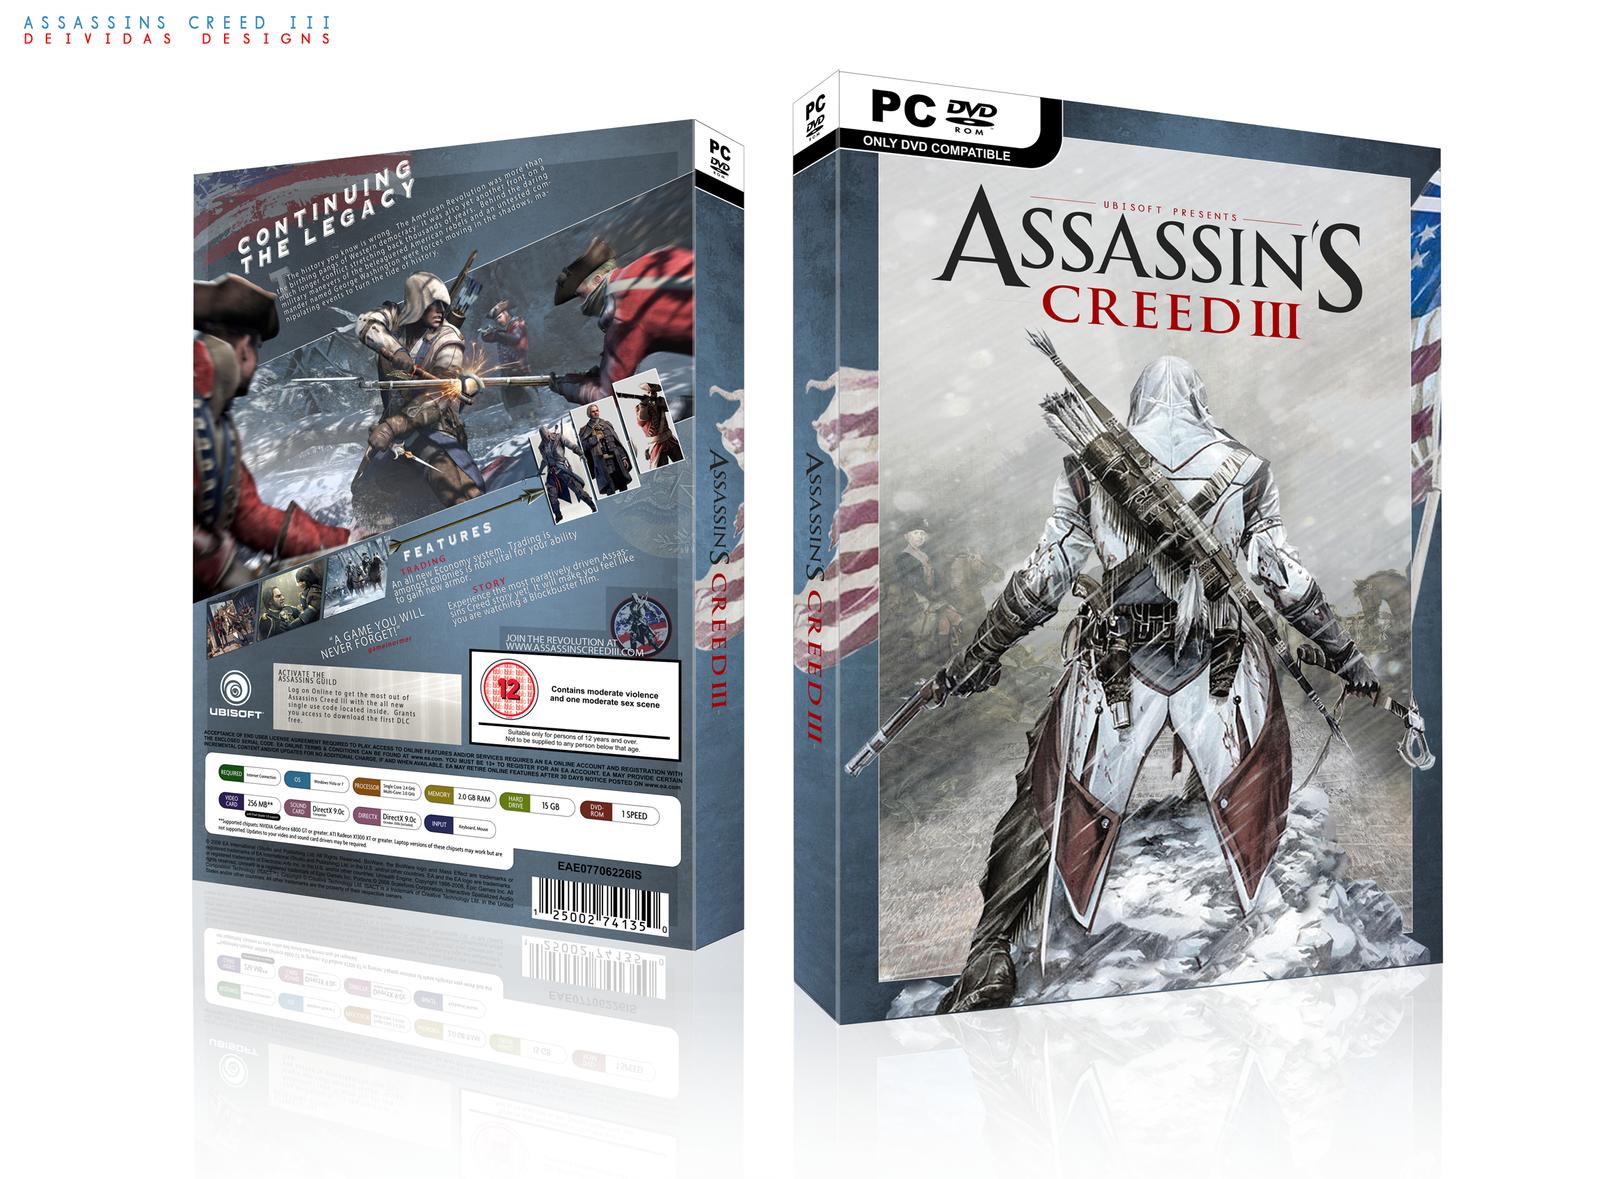 Assassins Creed III by Deividas12